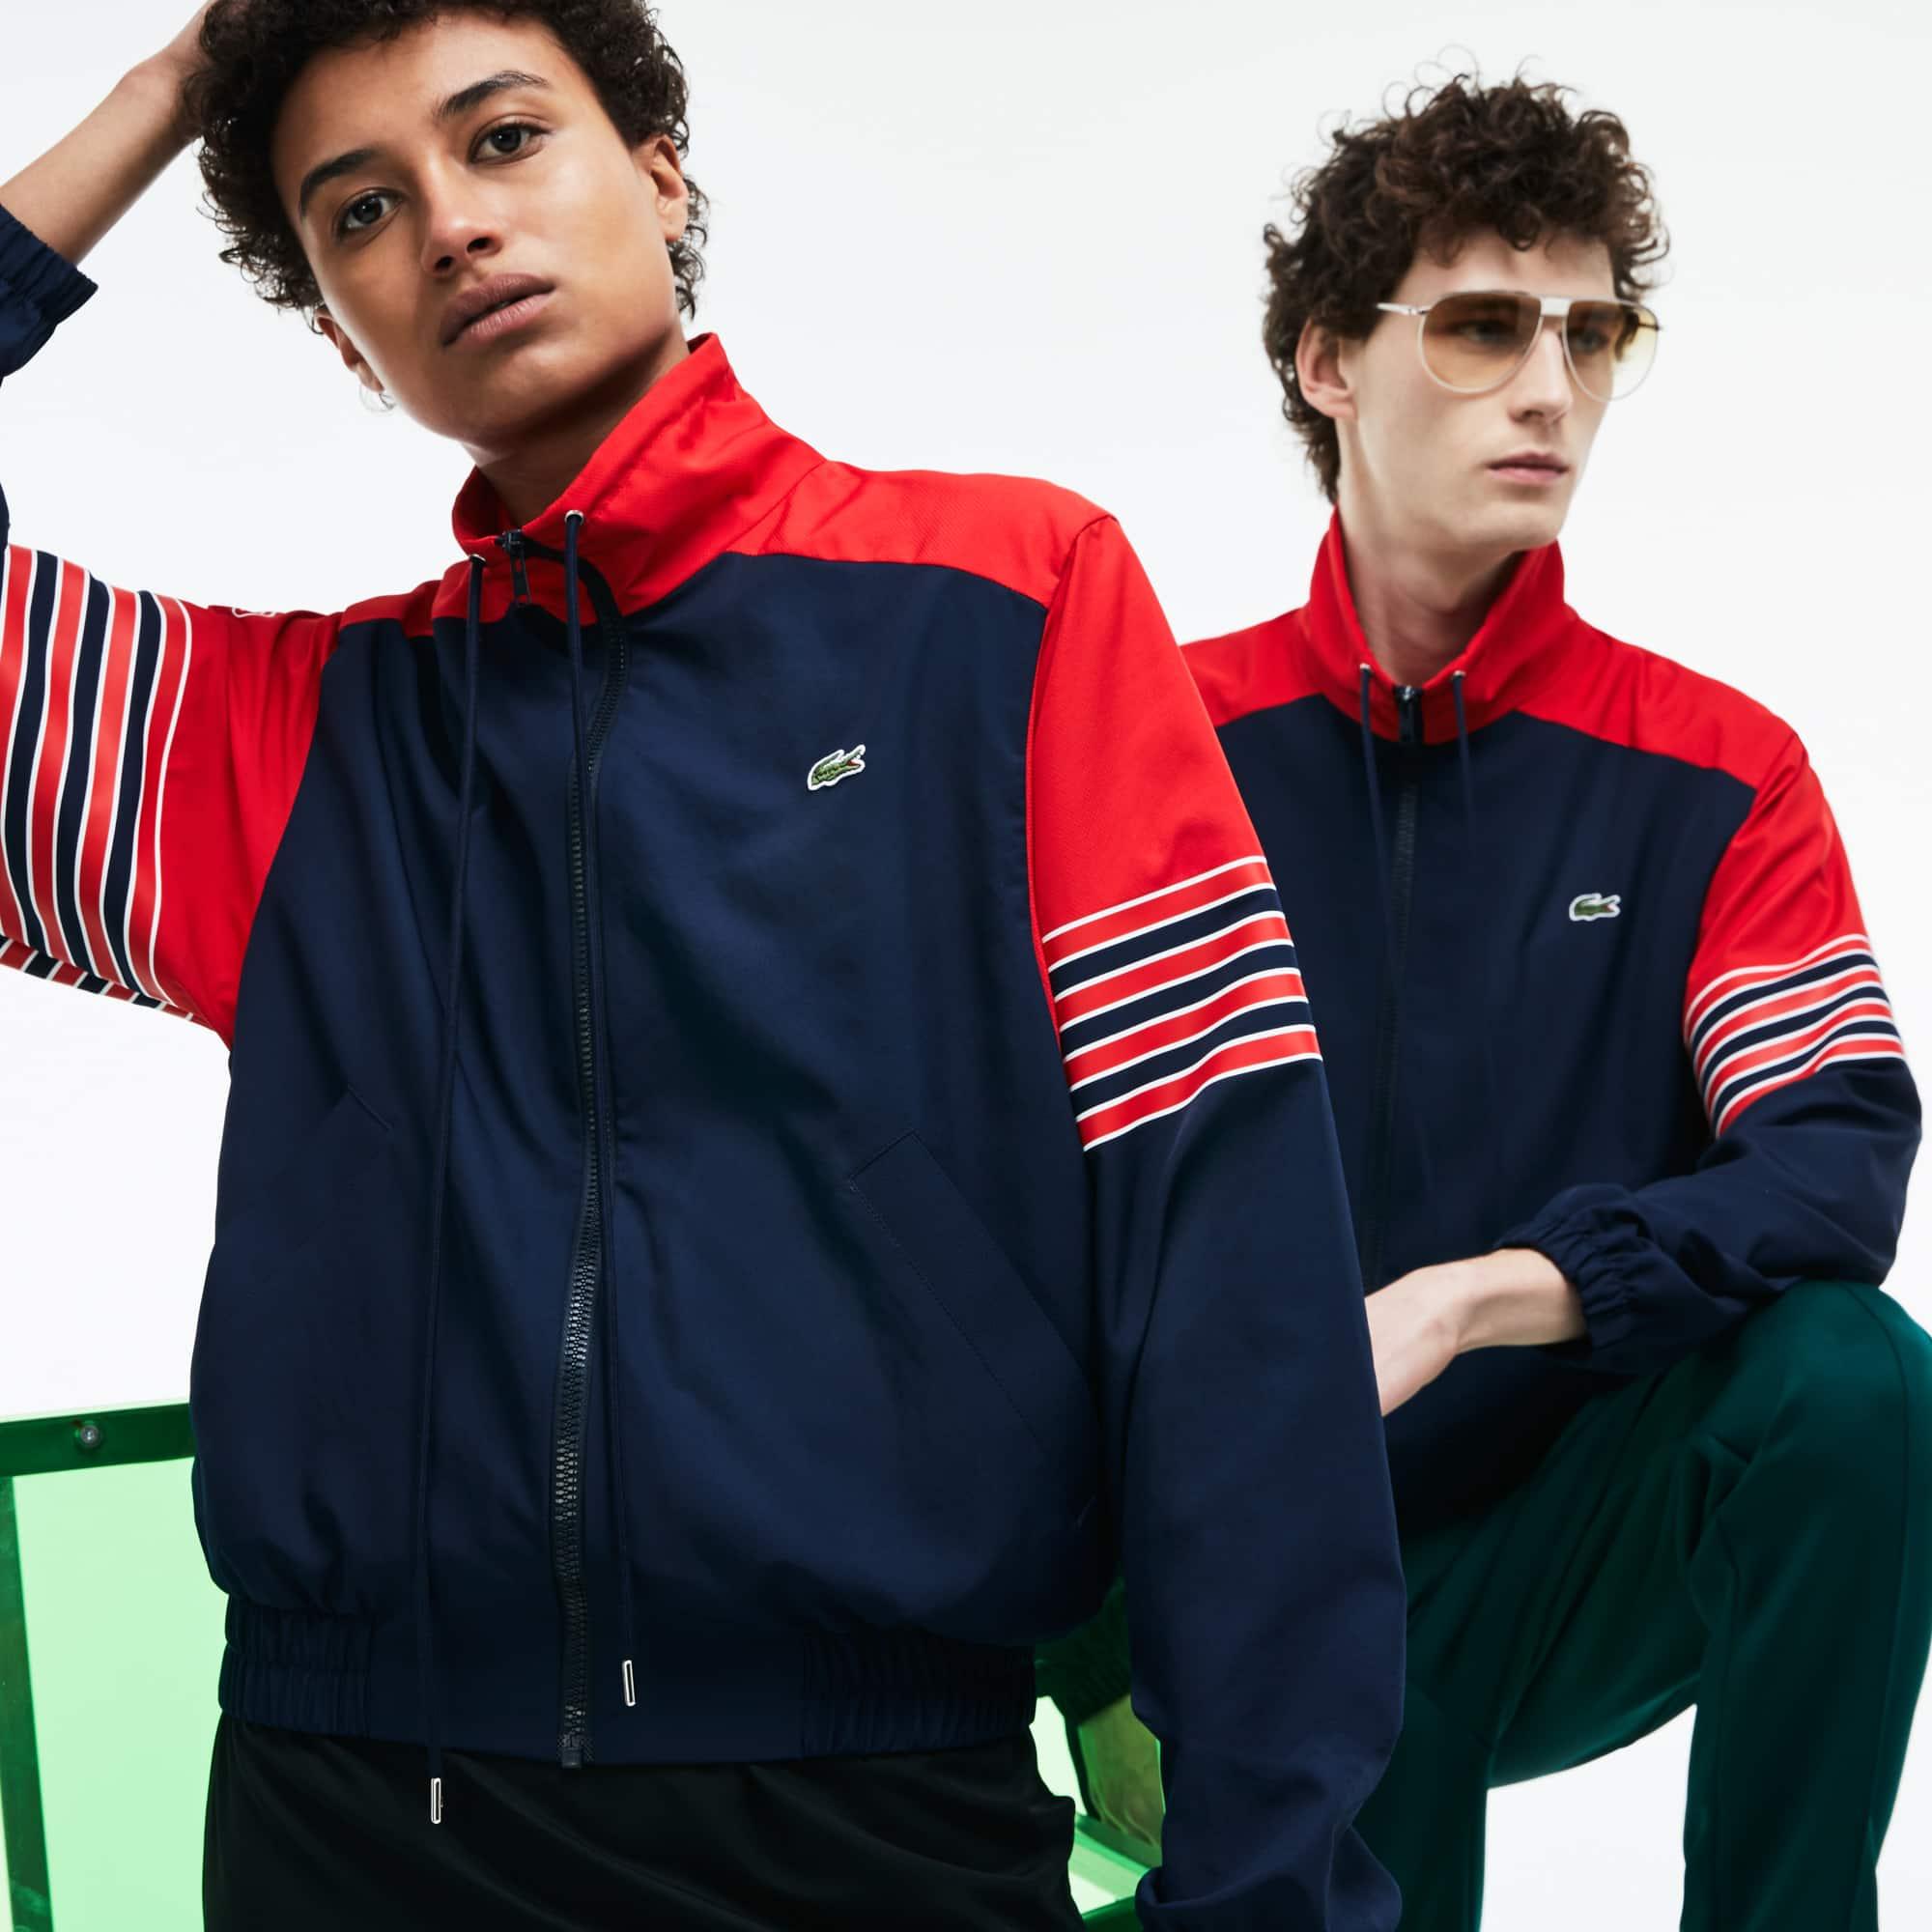 Unisex Fashion Show Colorblock Technical Canvas Zippered Jacket